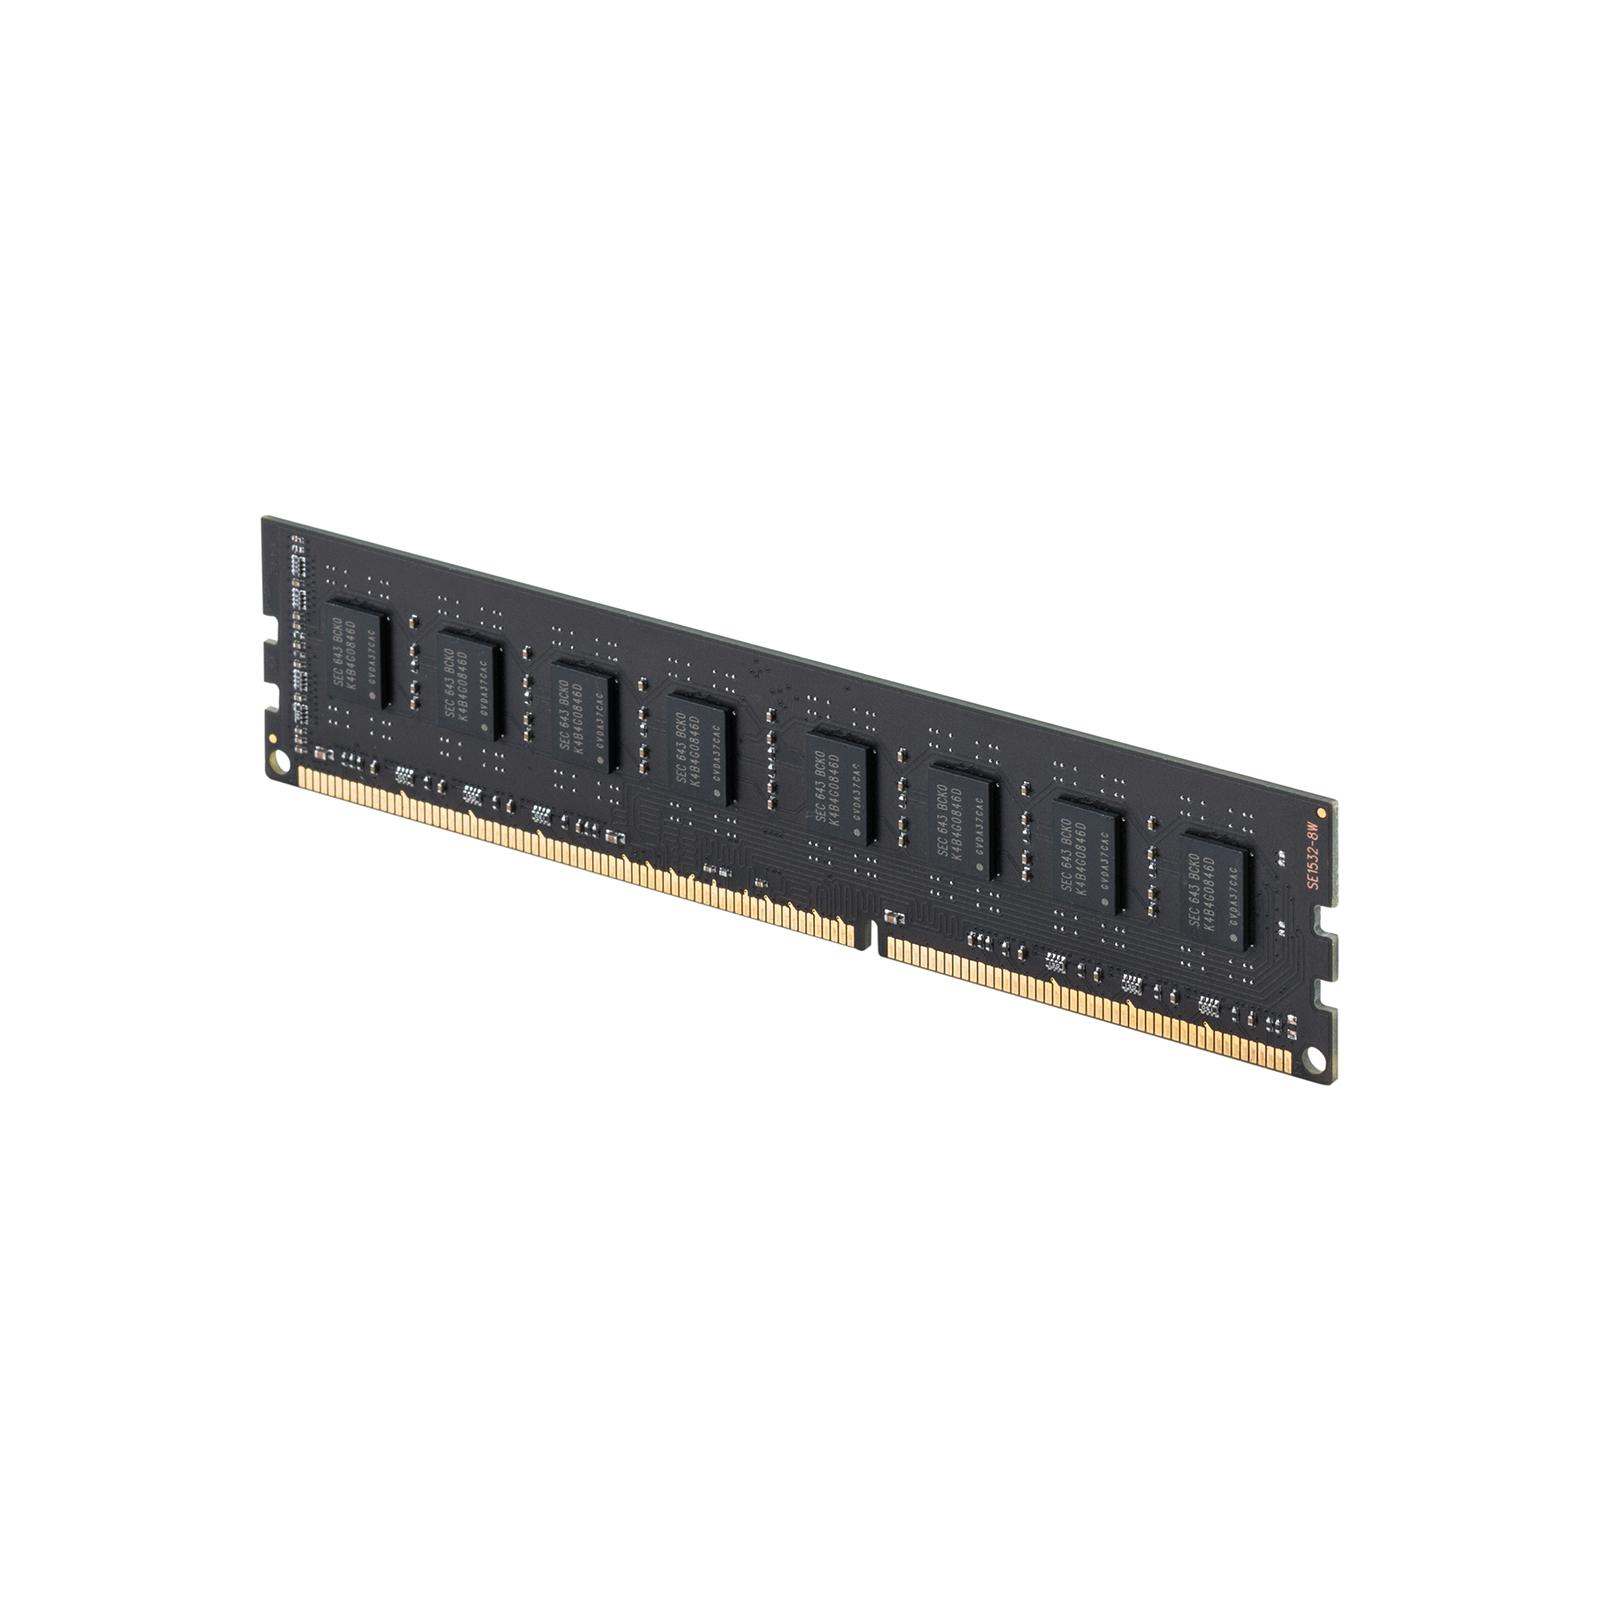 Модуль памяти для компьютера DDR3L 8GB 1600 MHz Samsung (M378B1G73EB0-YK0) изображение 3